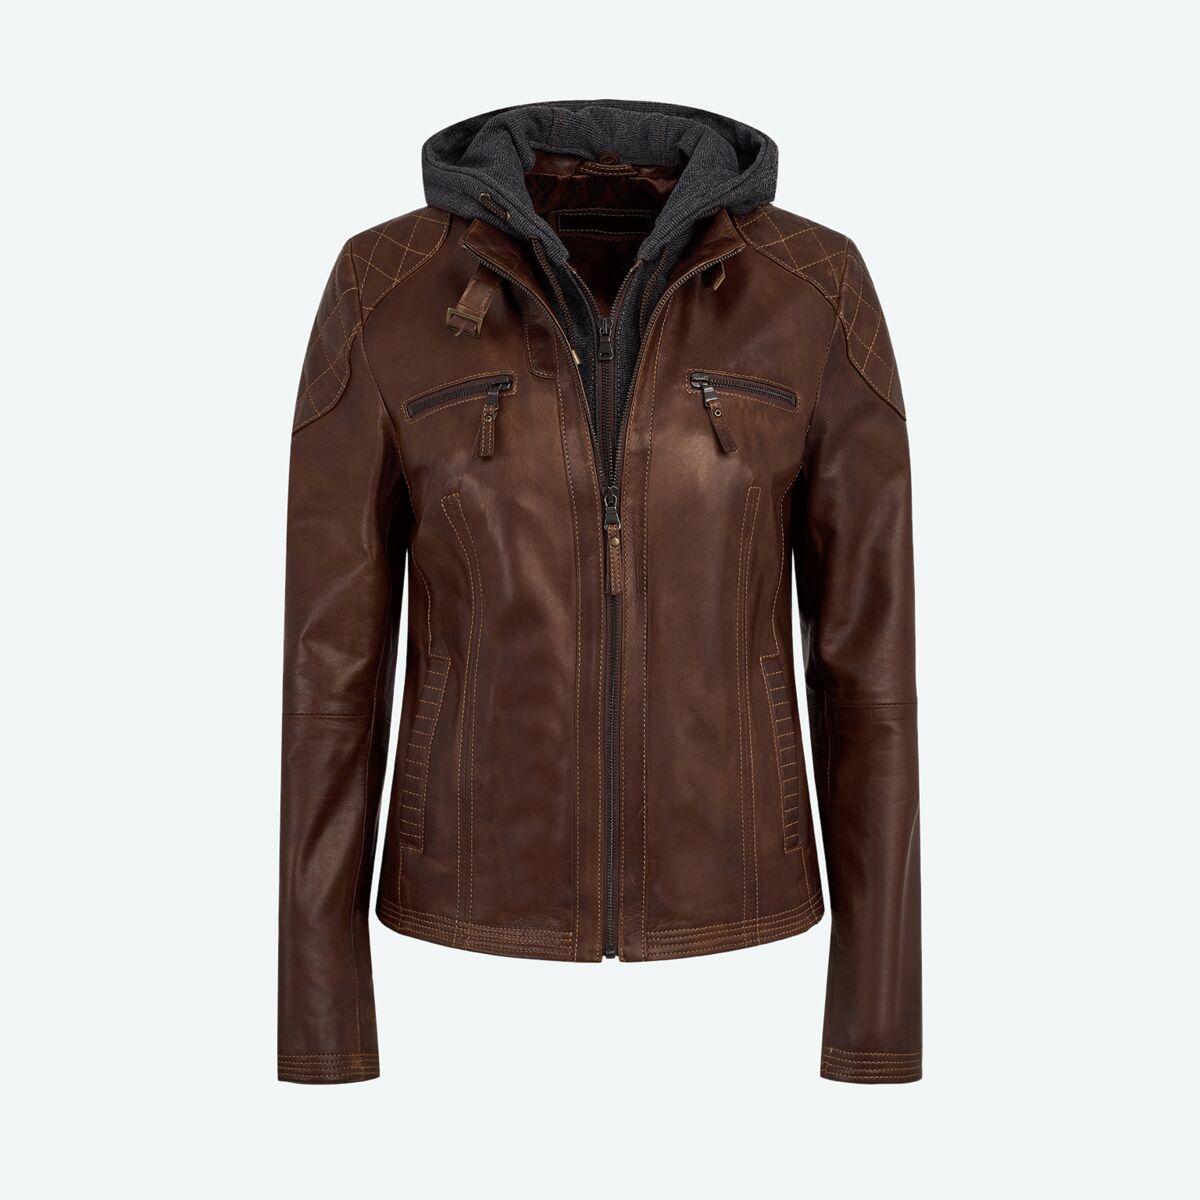 Women's Leather Jacket with Hood - Dark Brown